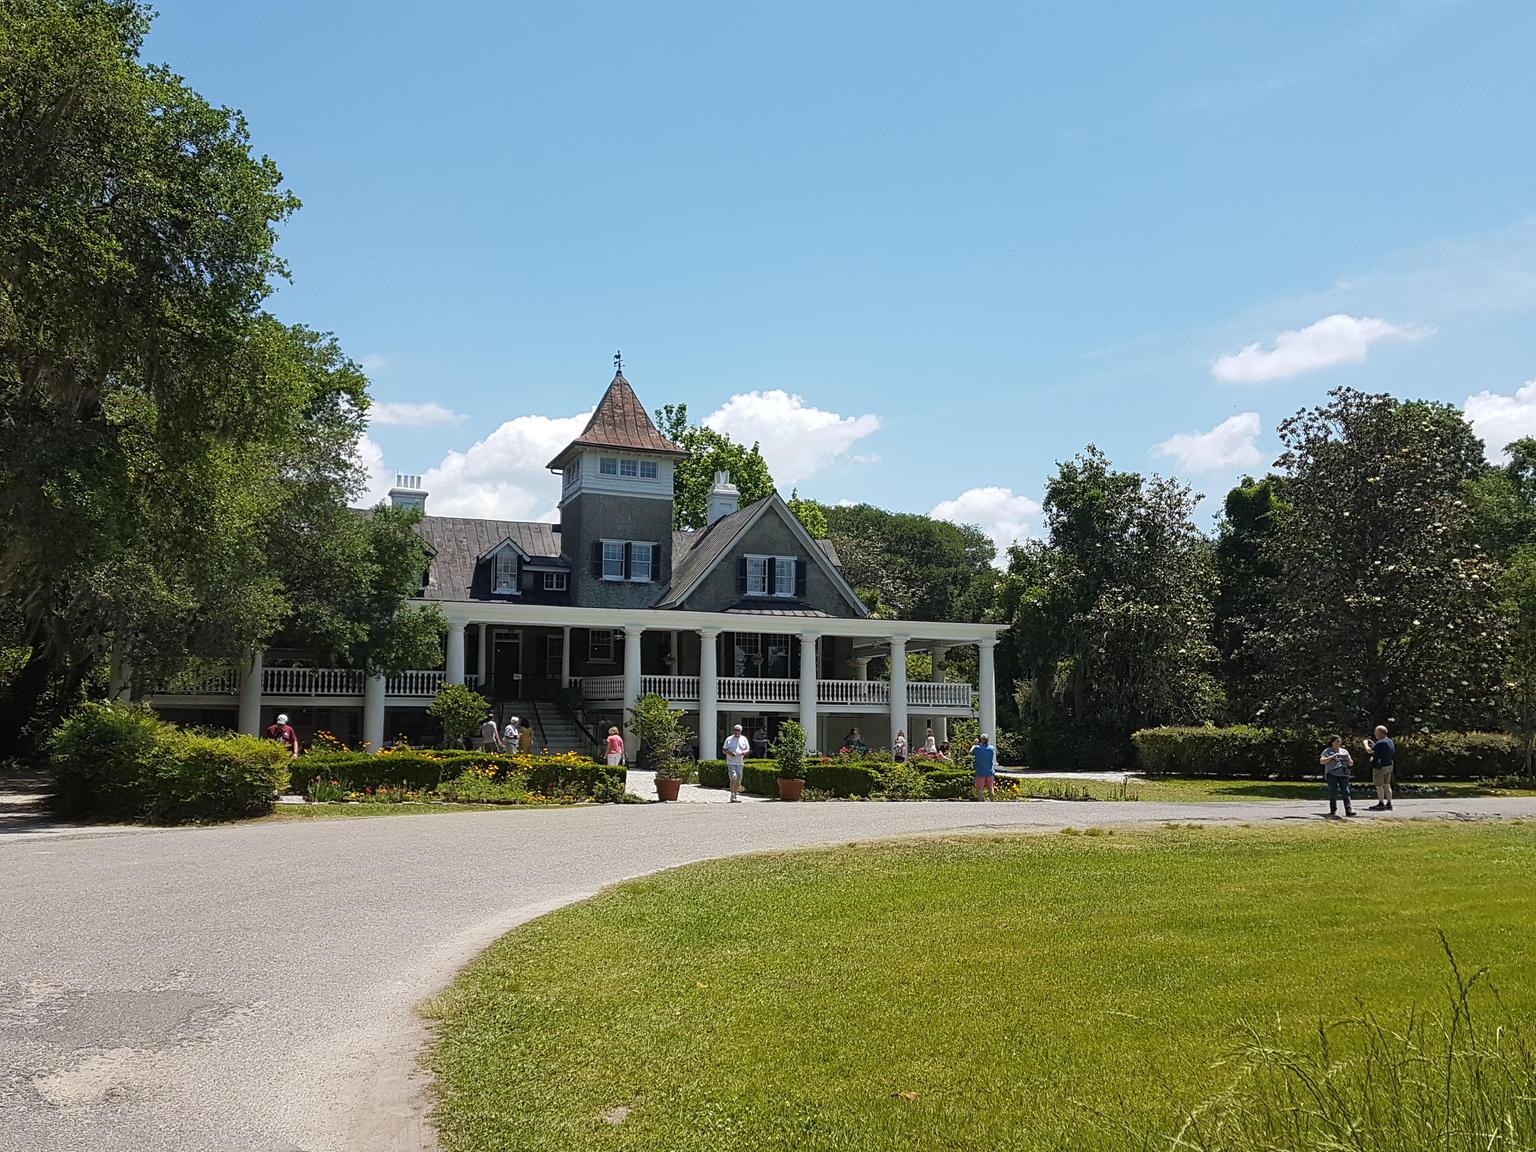 MÁS FOTOS, Magnolia Plantation Admission & Tour with Transportation from Charleston